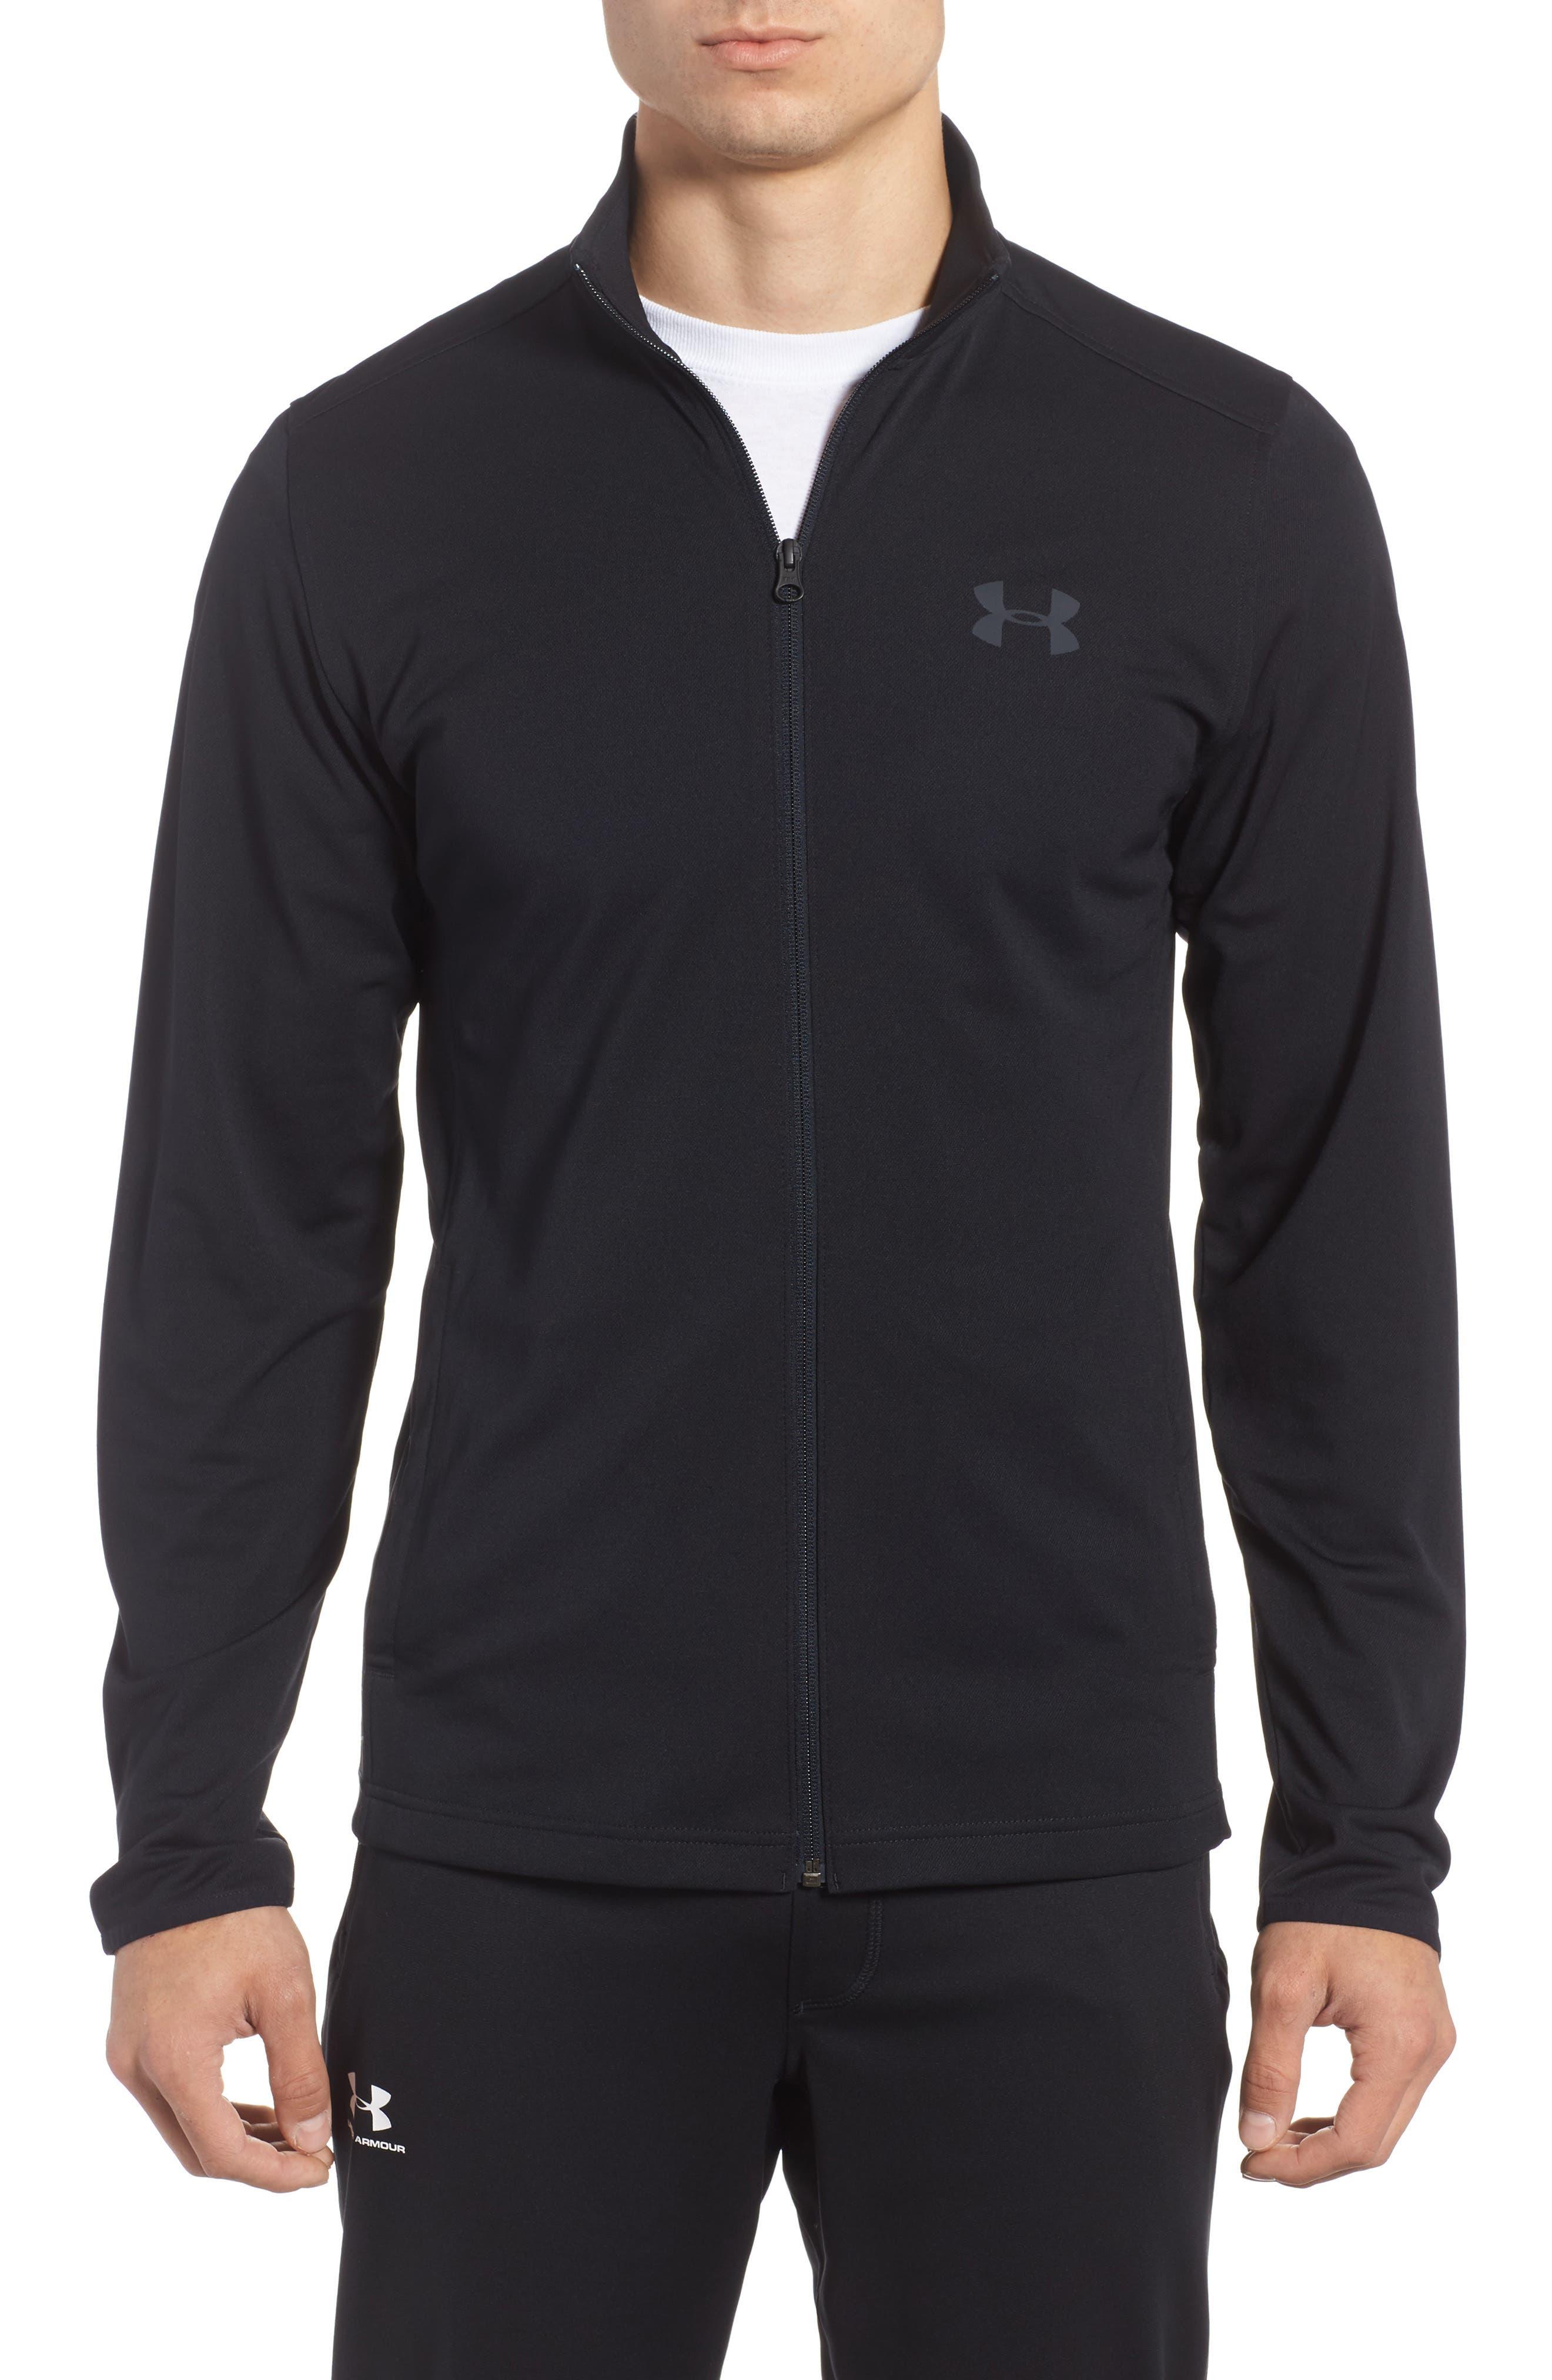 HeatGear<sup>®</sup> Regular Fit Maverick Jacket,                         Main,                         color, Black / Black / Stealth Grey